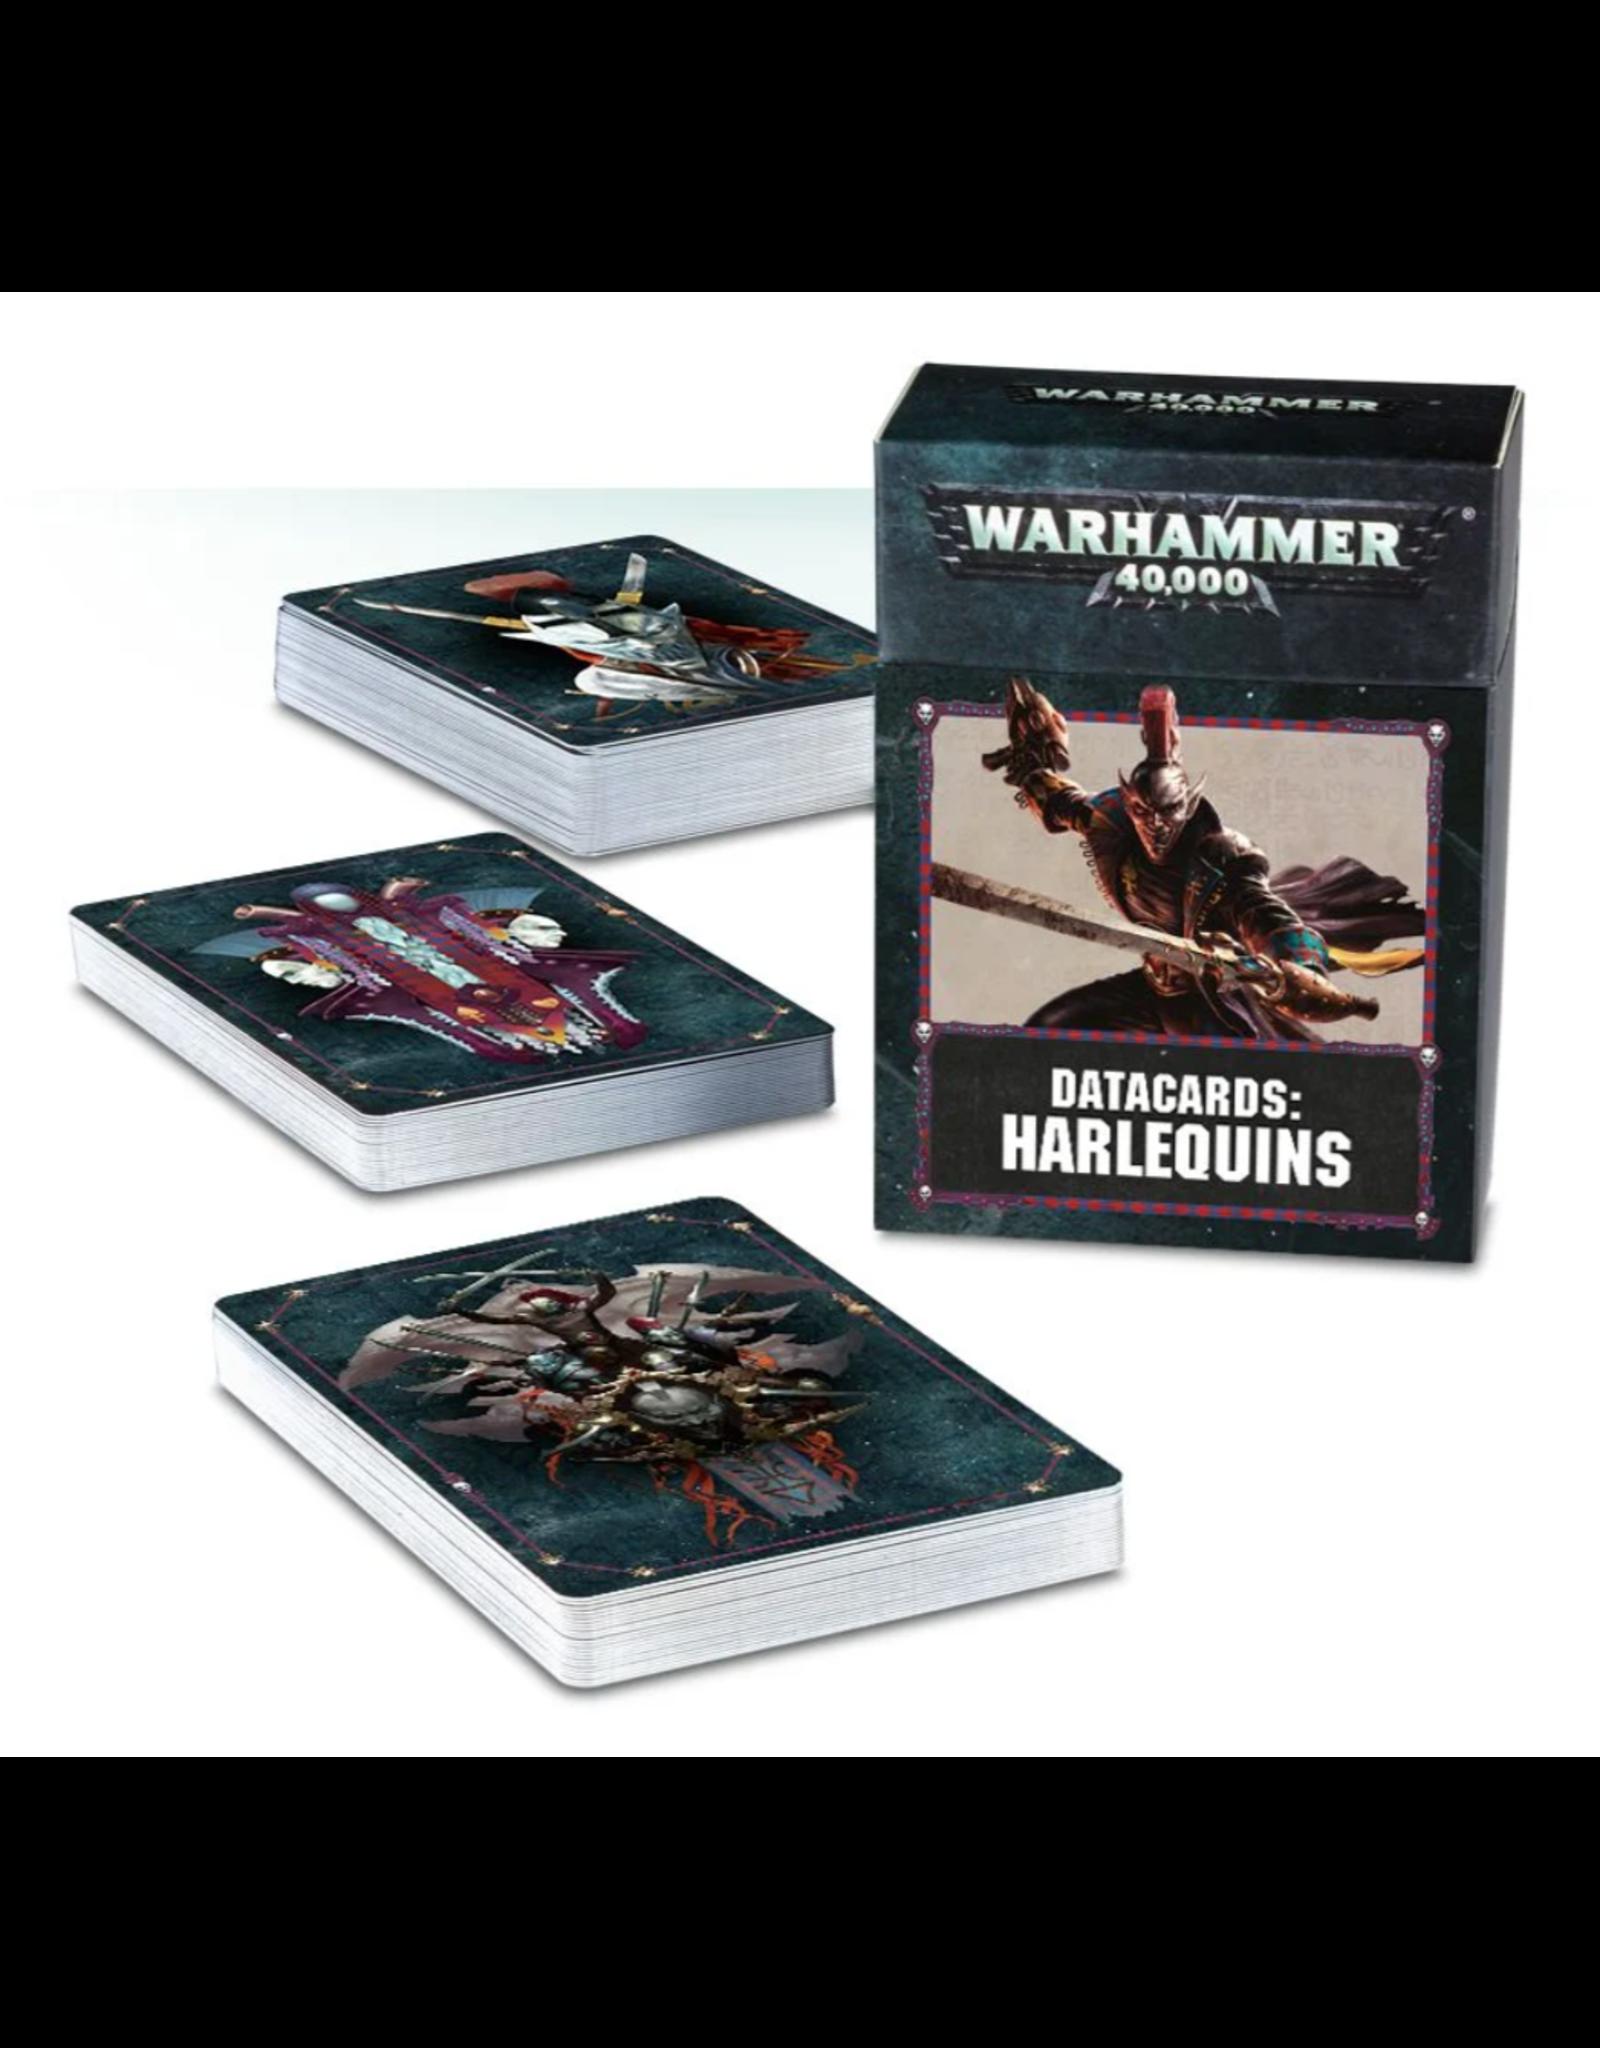 Warhammer 40K Harlequins Datacards